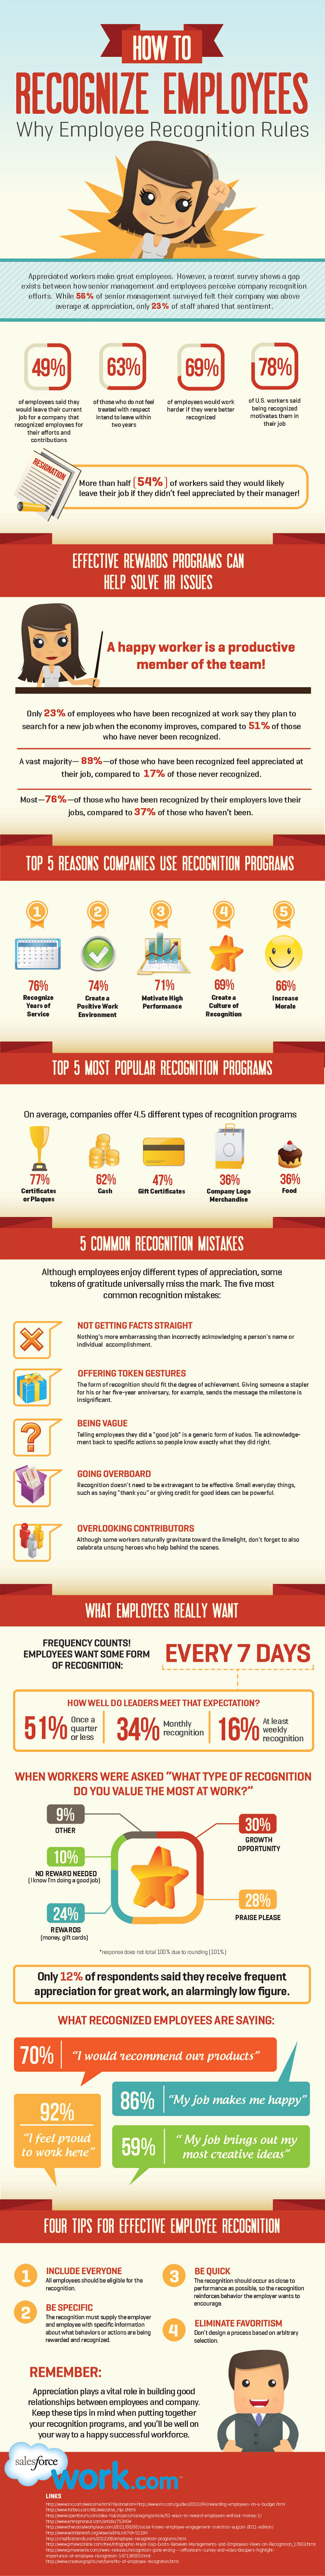 Best Ways for Employee Appreciation